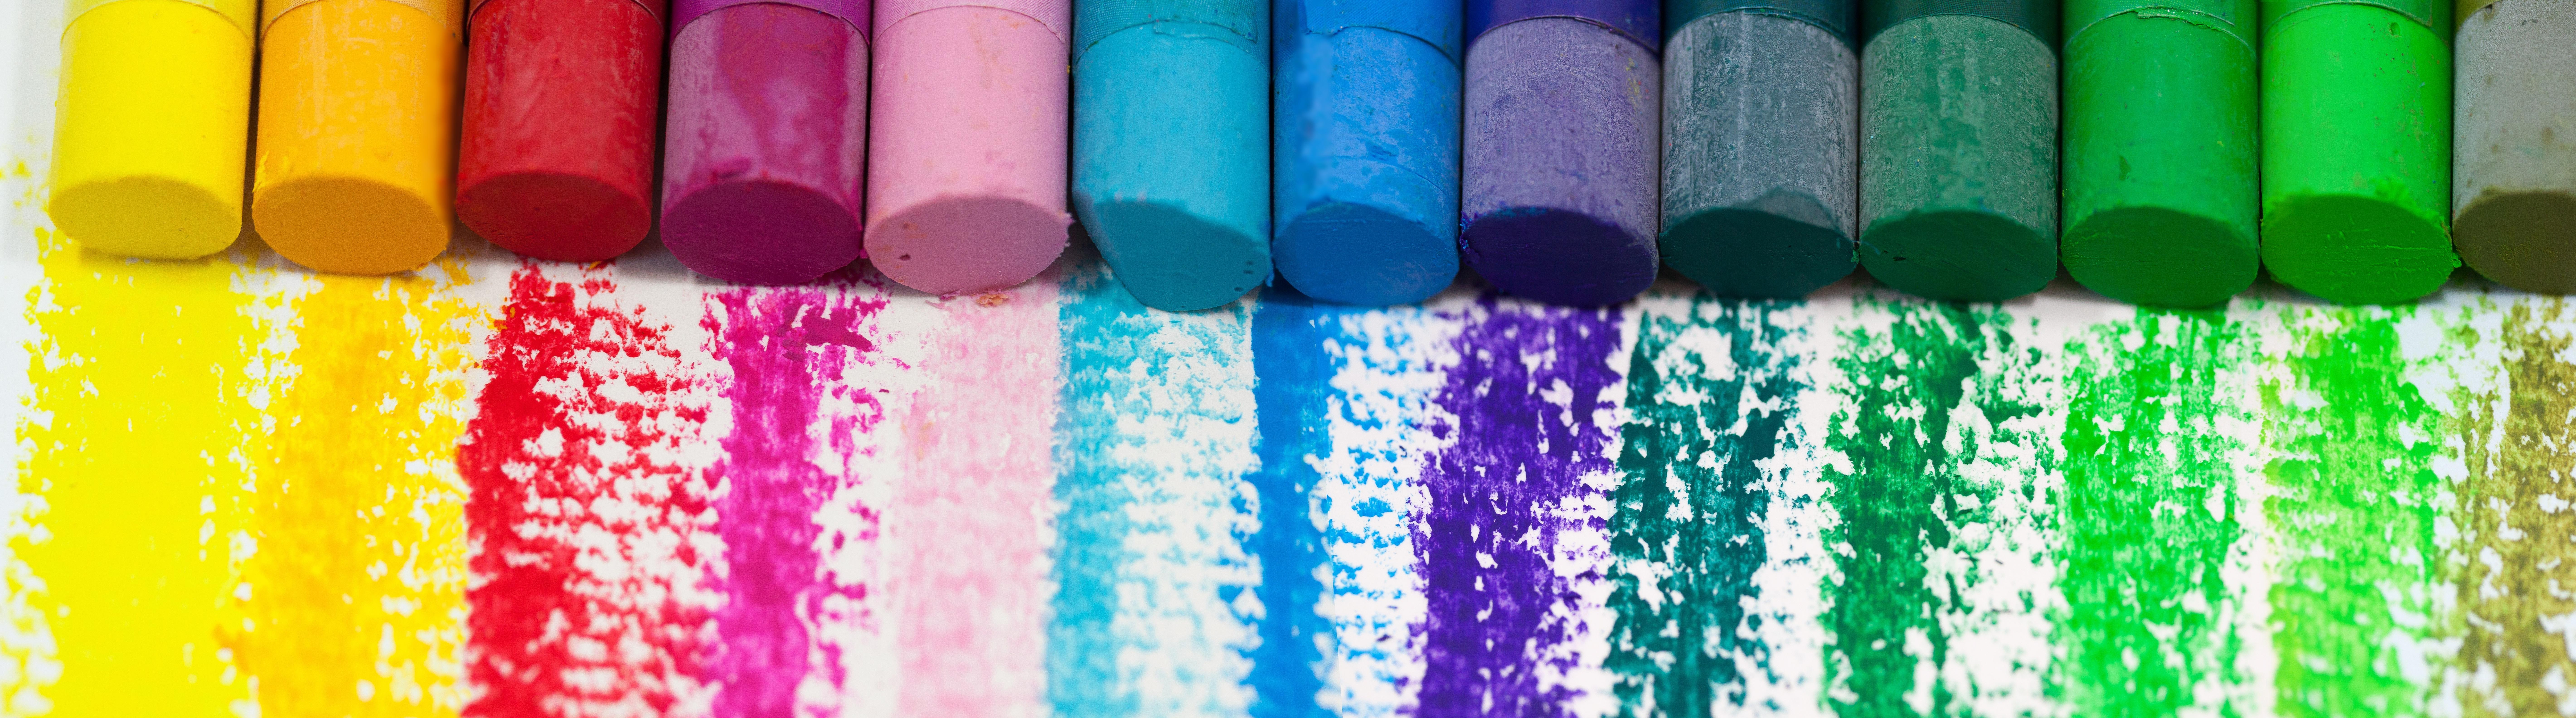 Colour in Digital Marketing: A beginner's guide